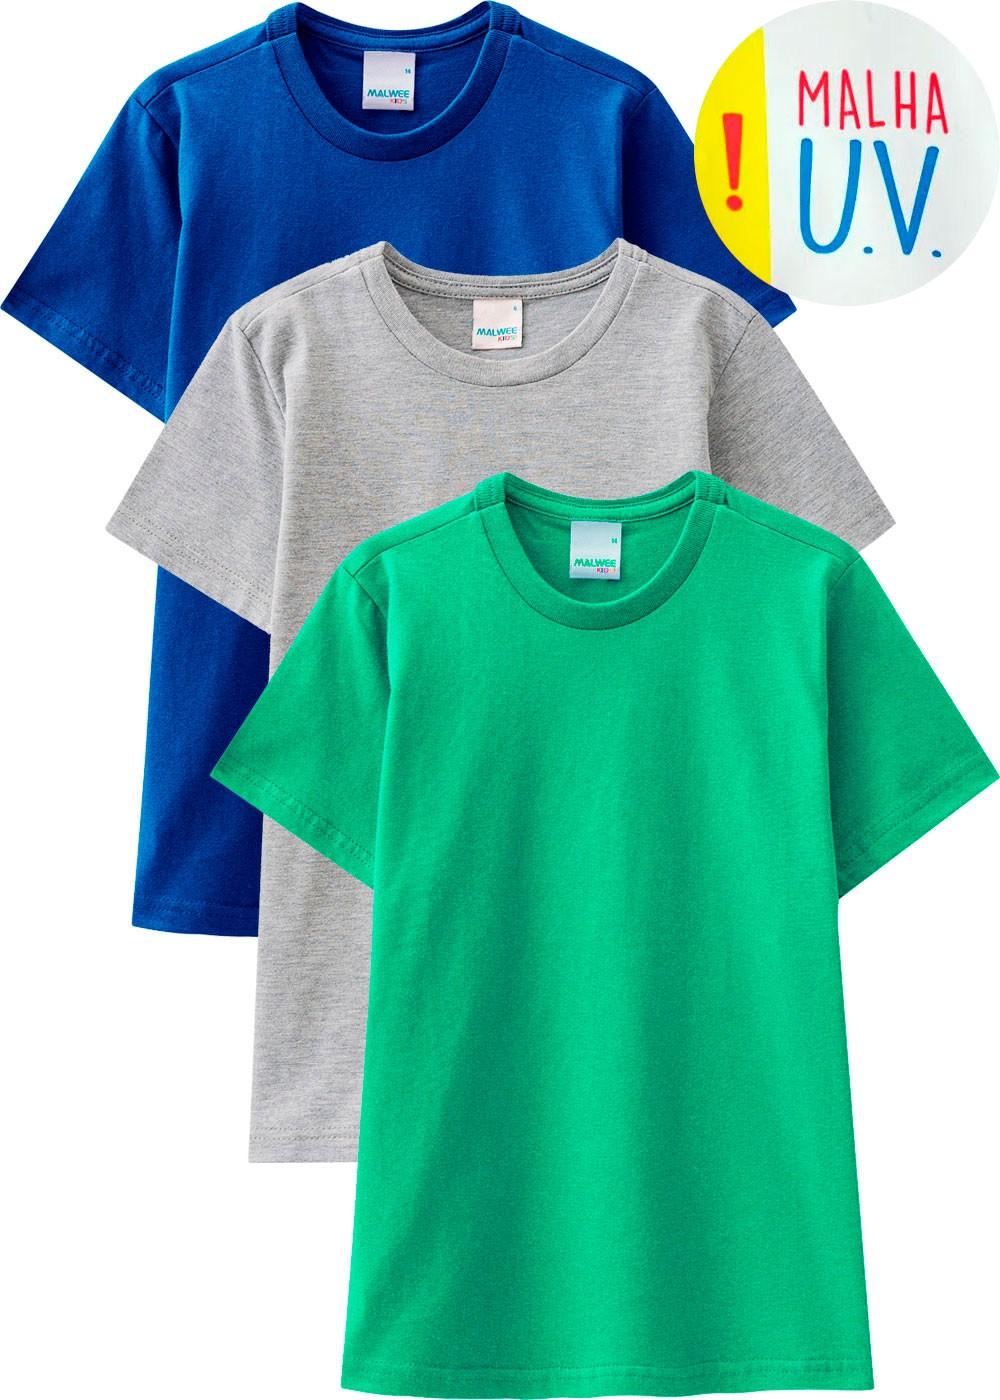 Kit com 3 Camiseta Infantil Masculina na Malha UV - Malwee